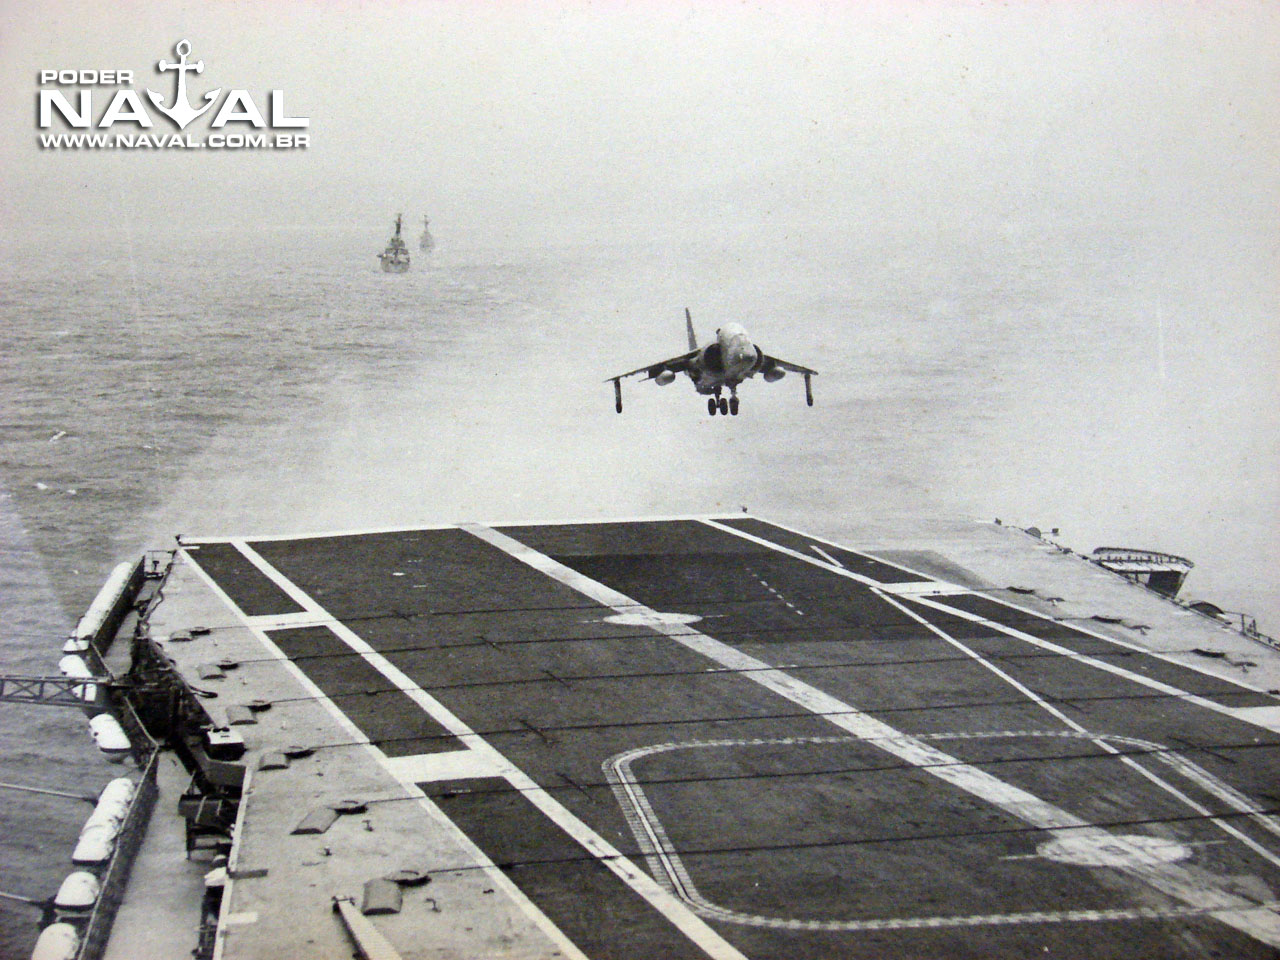 O Harrier pousando verticalmente a bordo do NAeL Minas Gerais